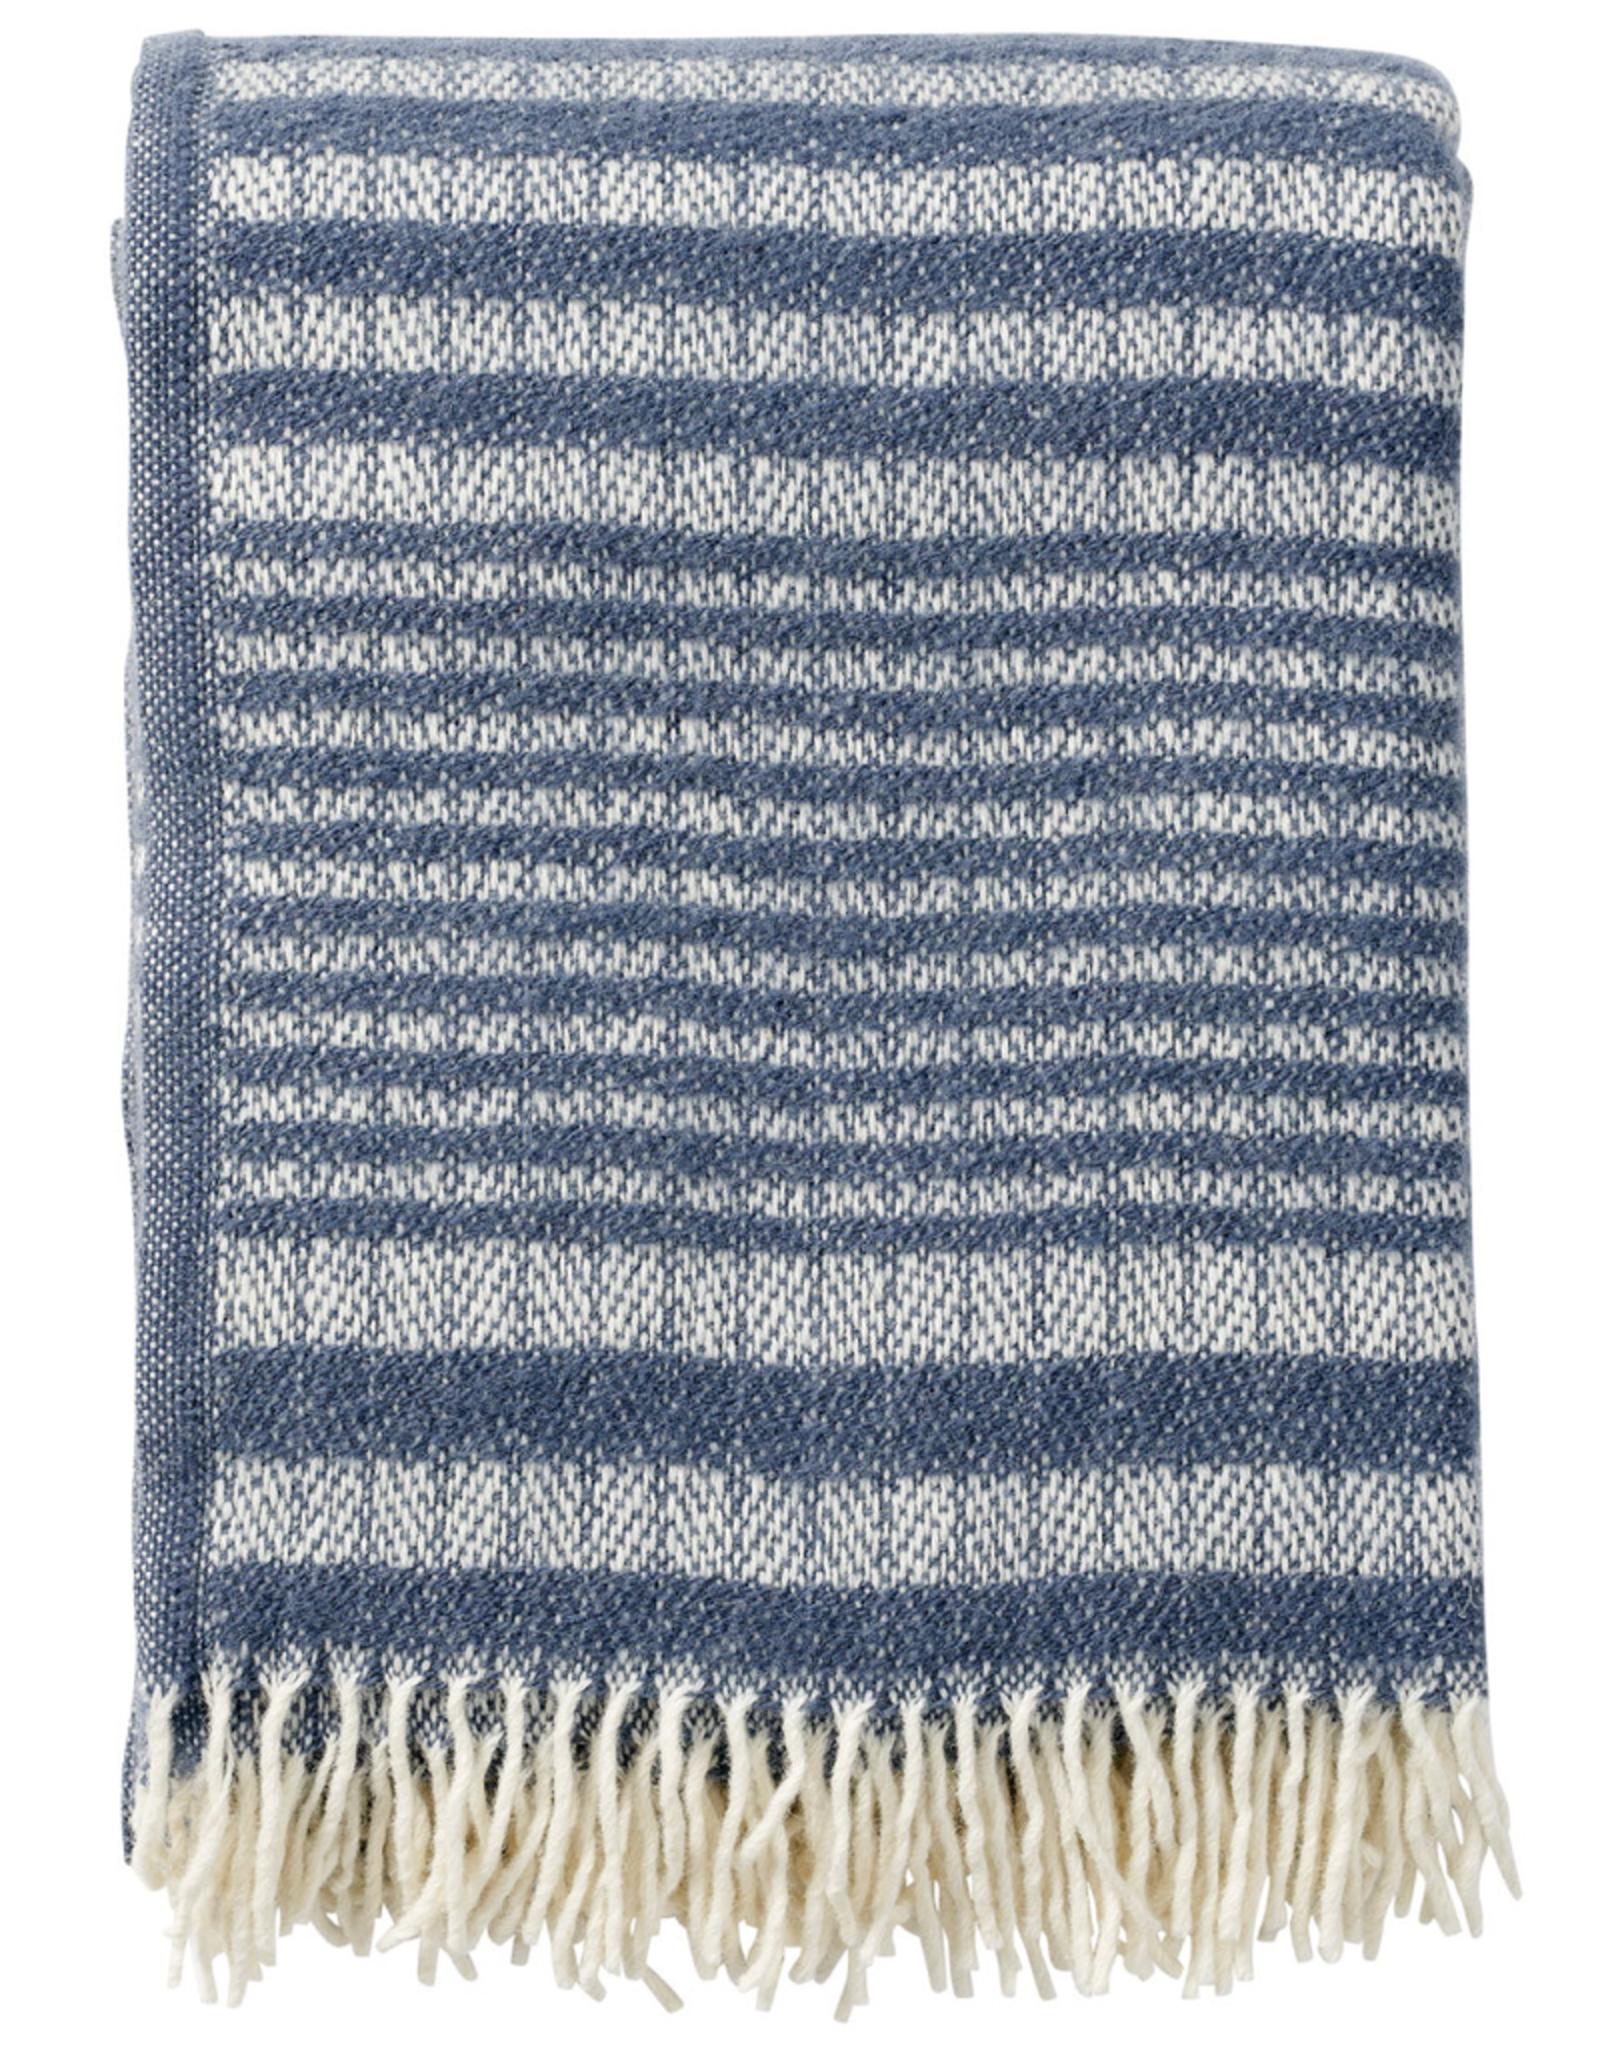 Roy Throw Dusty Blue - 100% Eco Lambs Wool